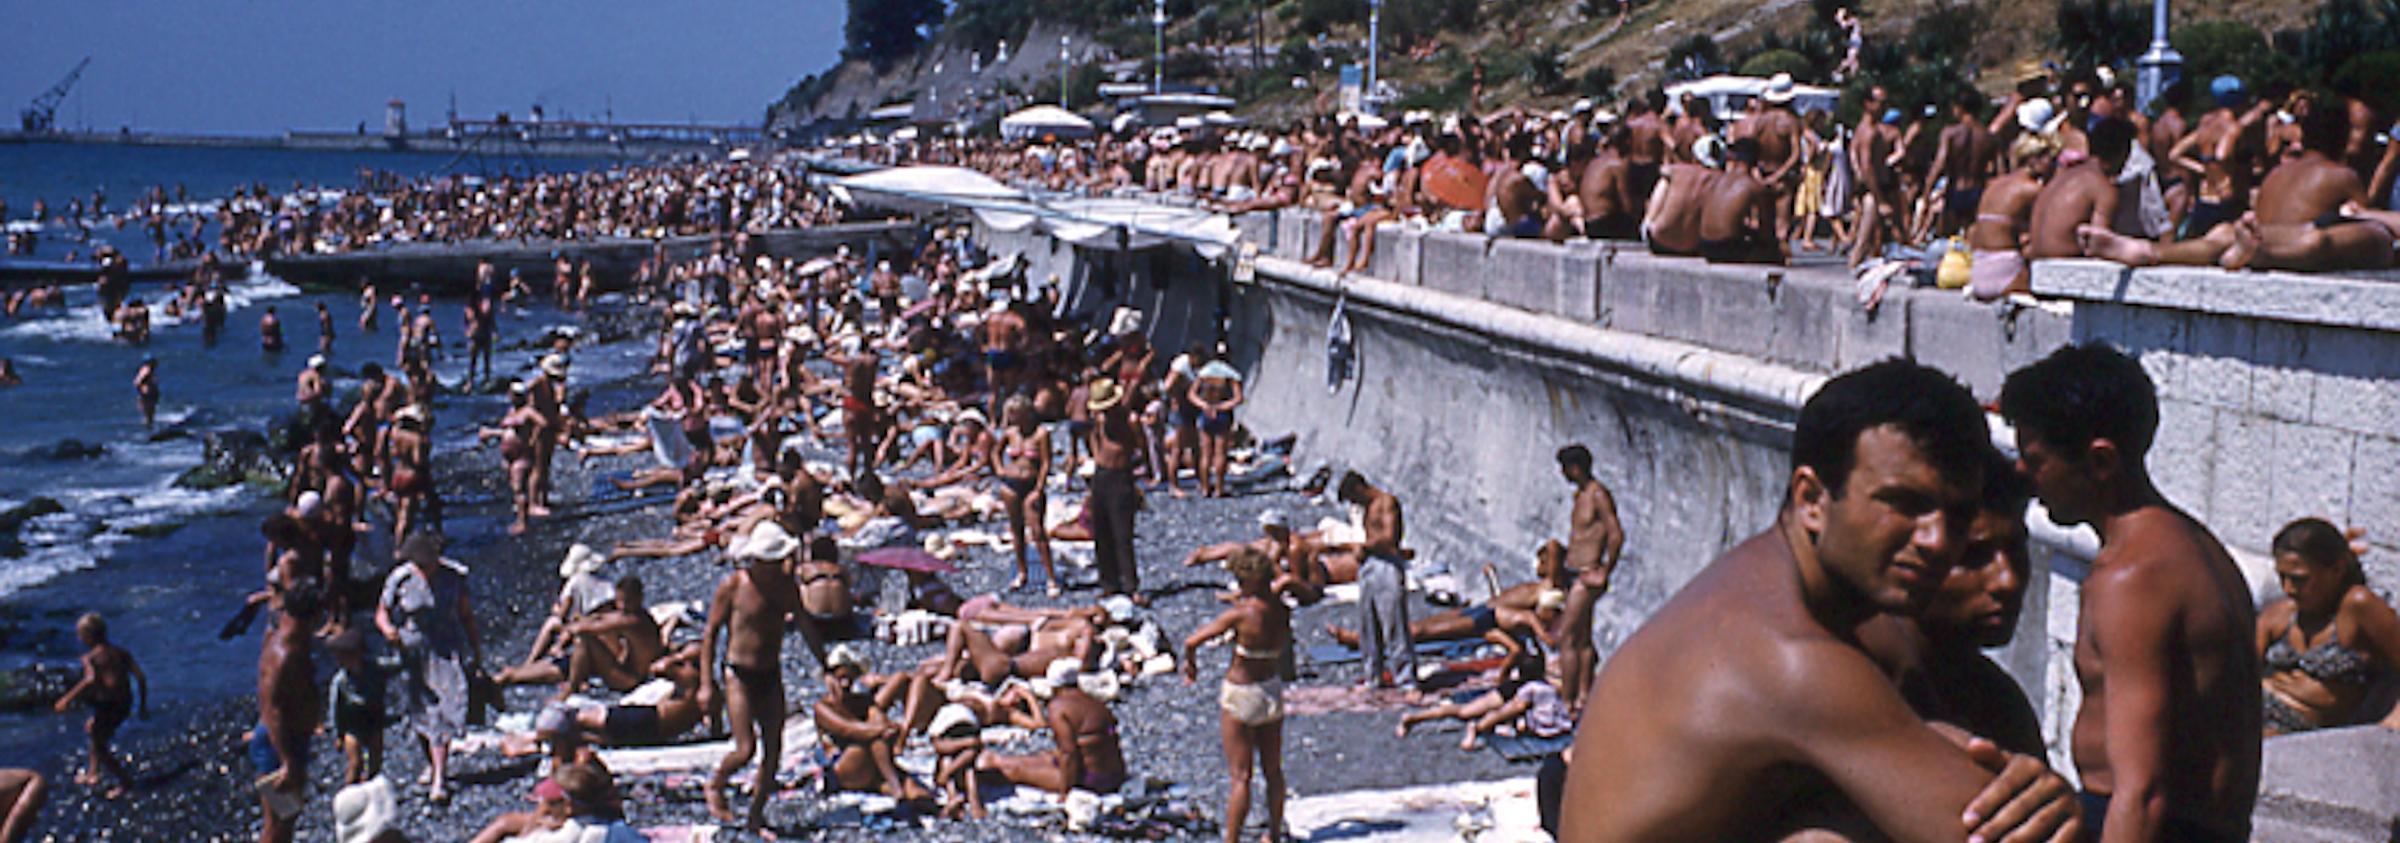 1961 Sochi Beach T9 009 header image 2400